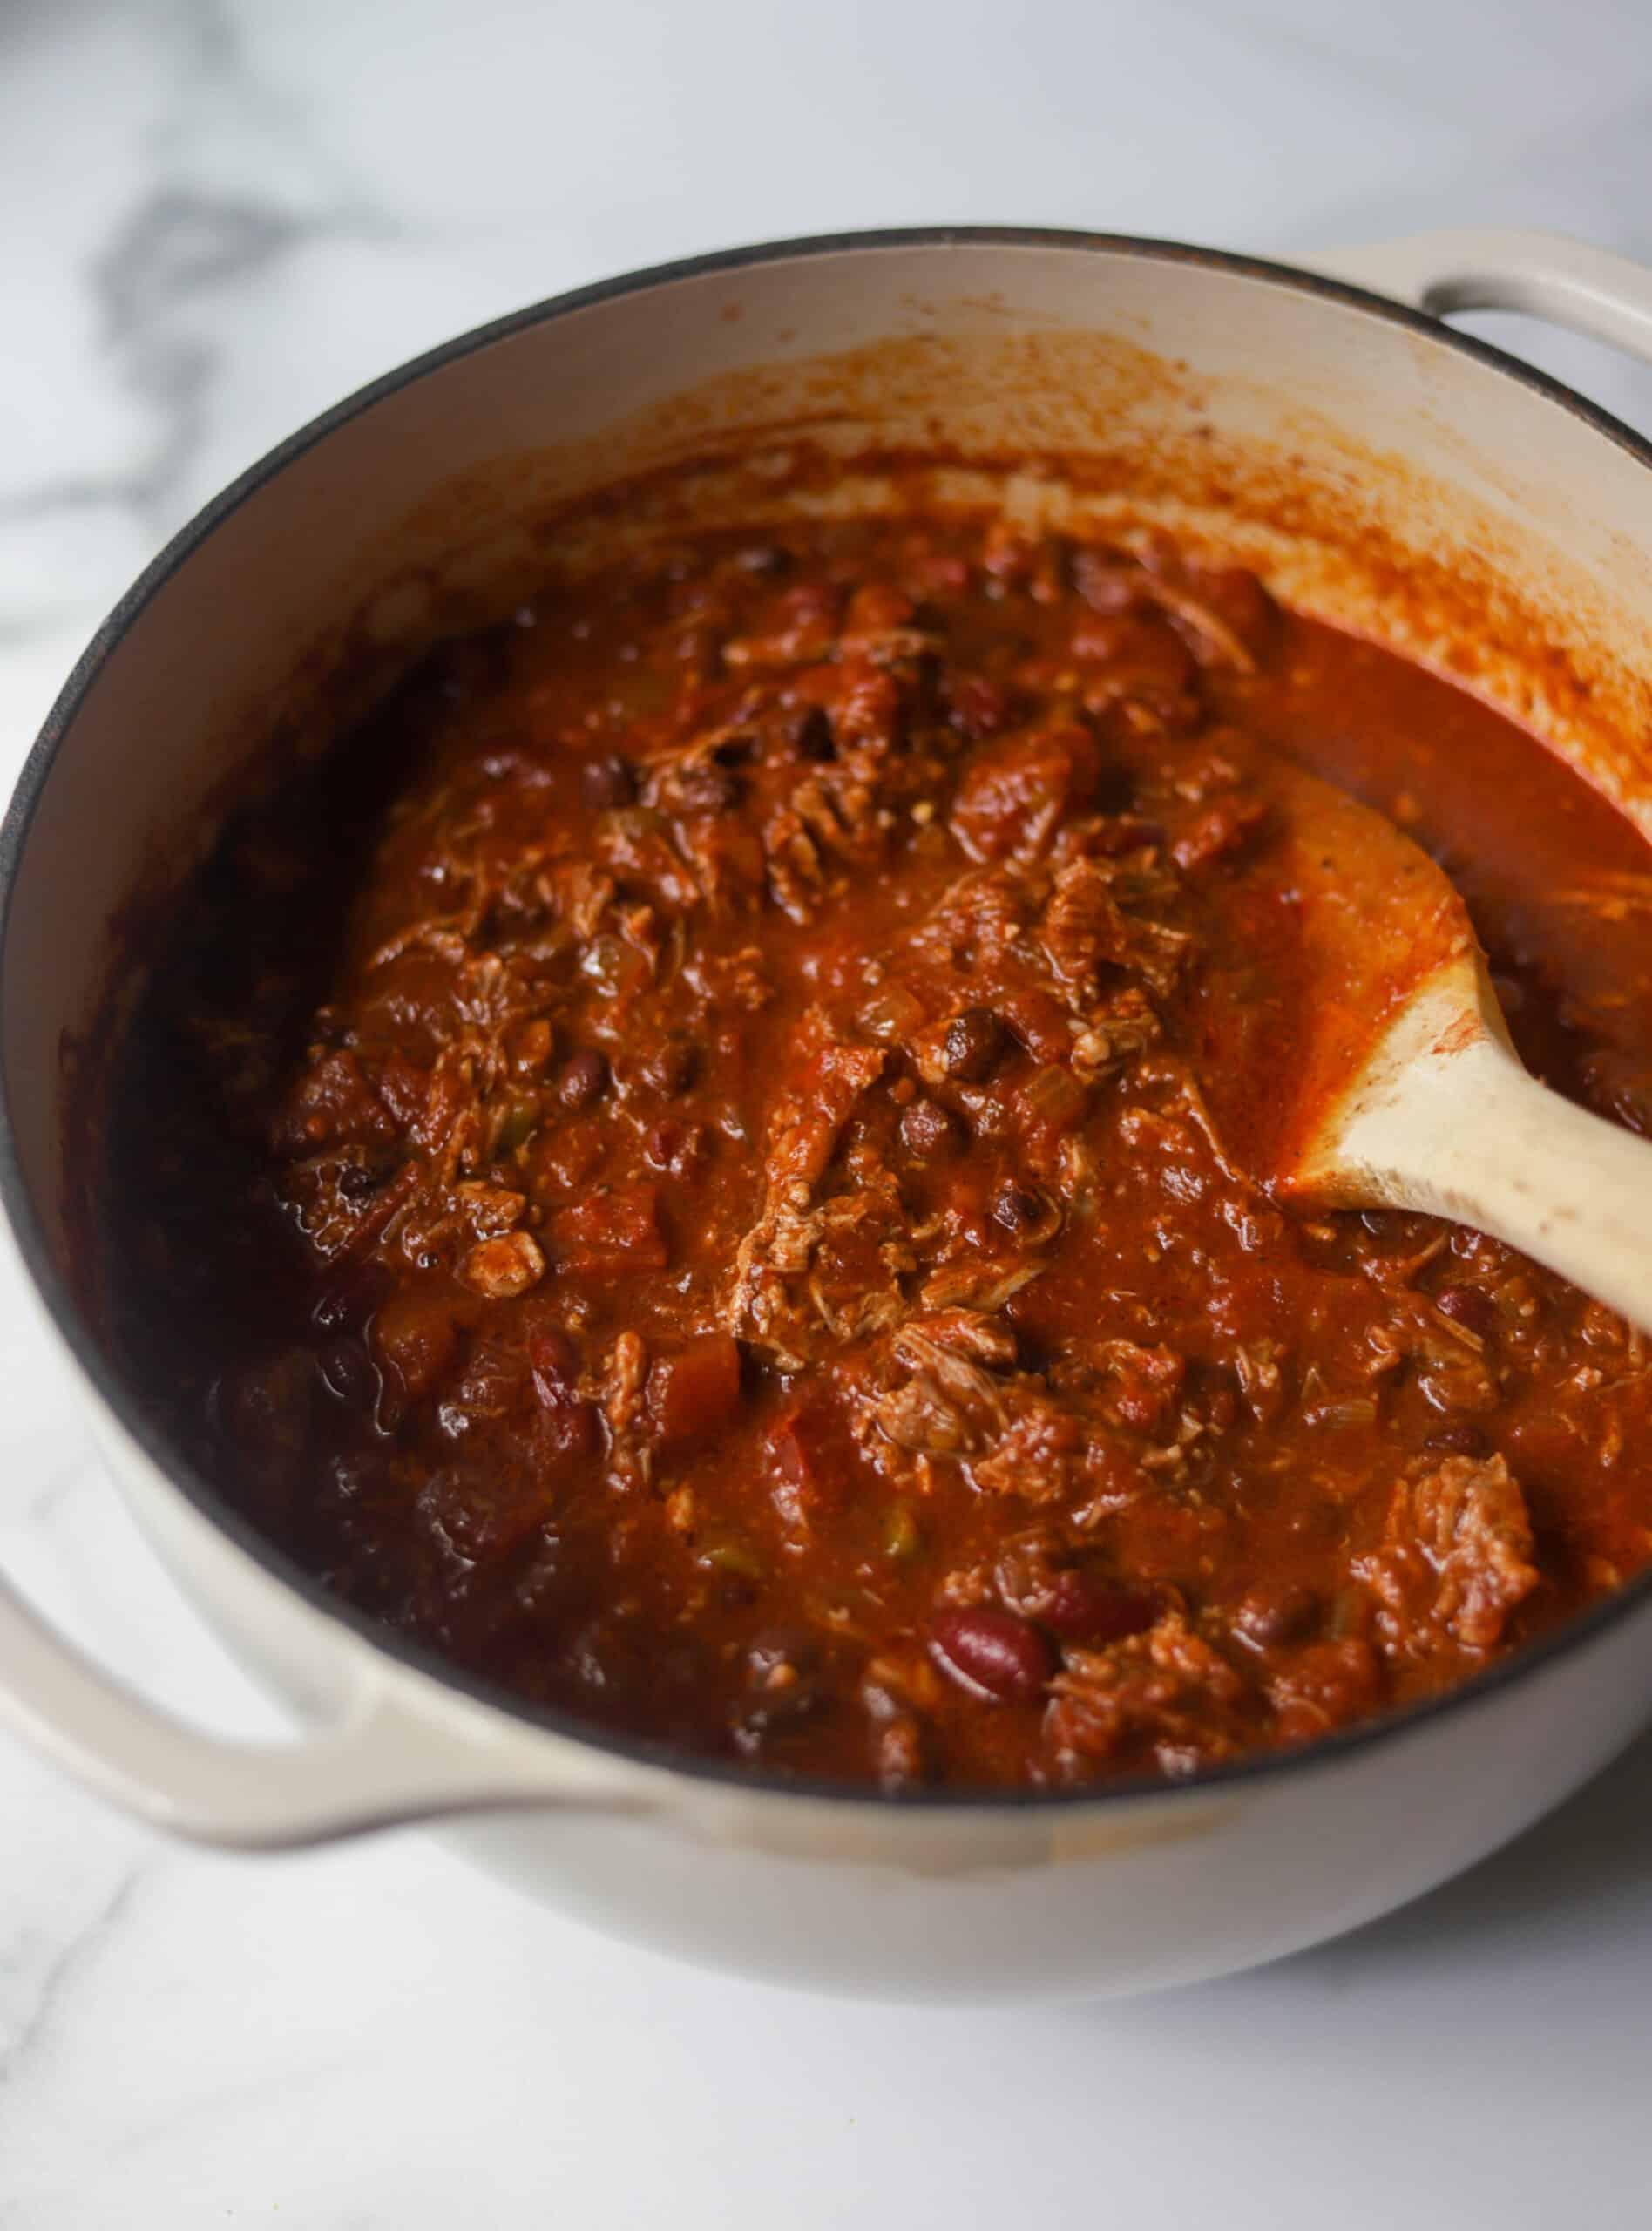 A big pot of pulled pork chili.